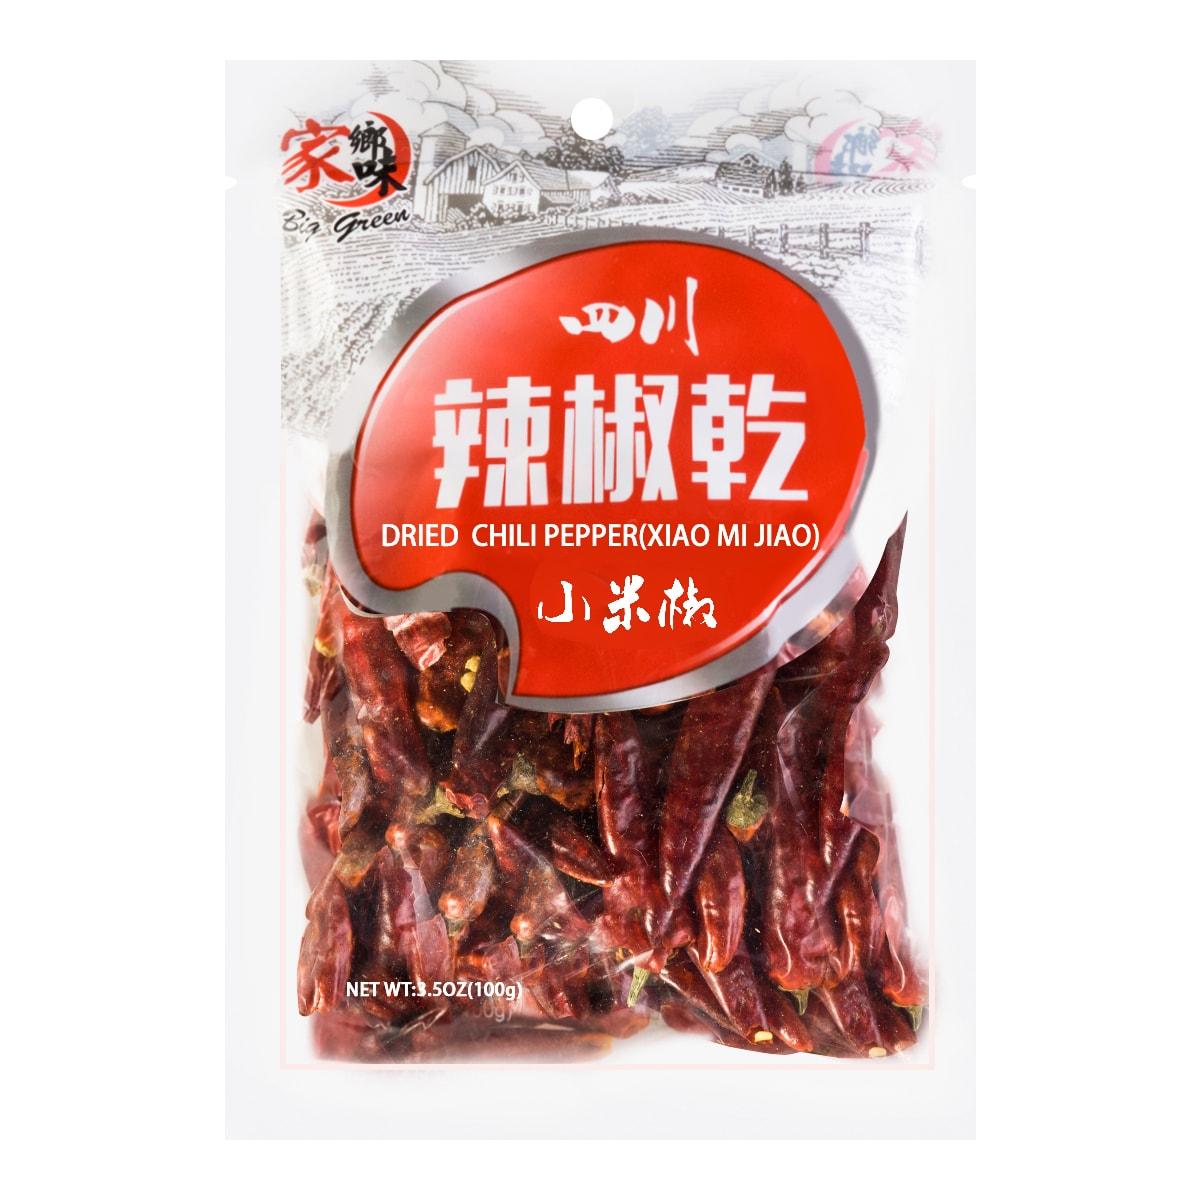 BIG GREEN Dried Chili Pepper 100g